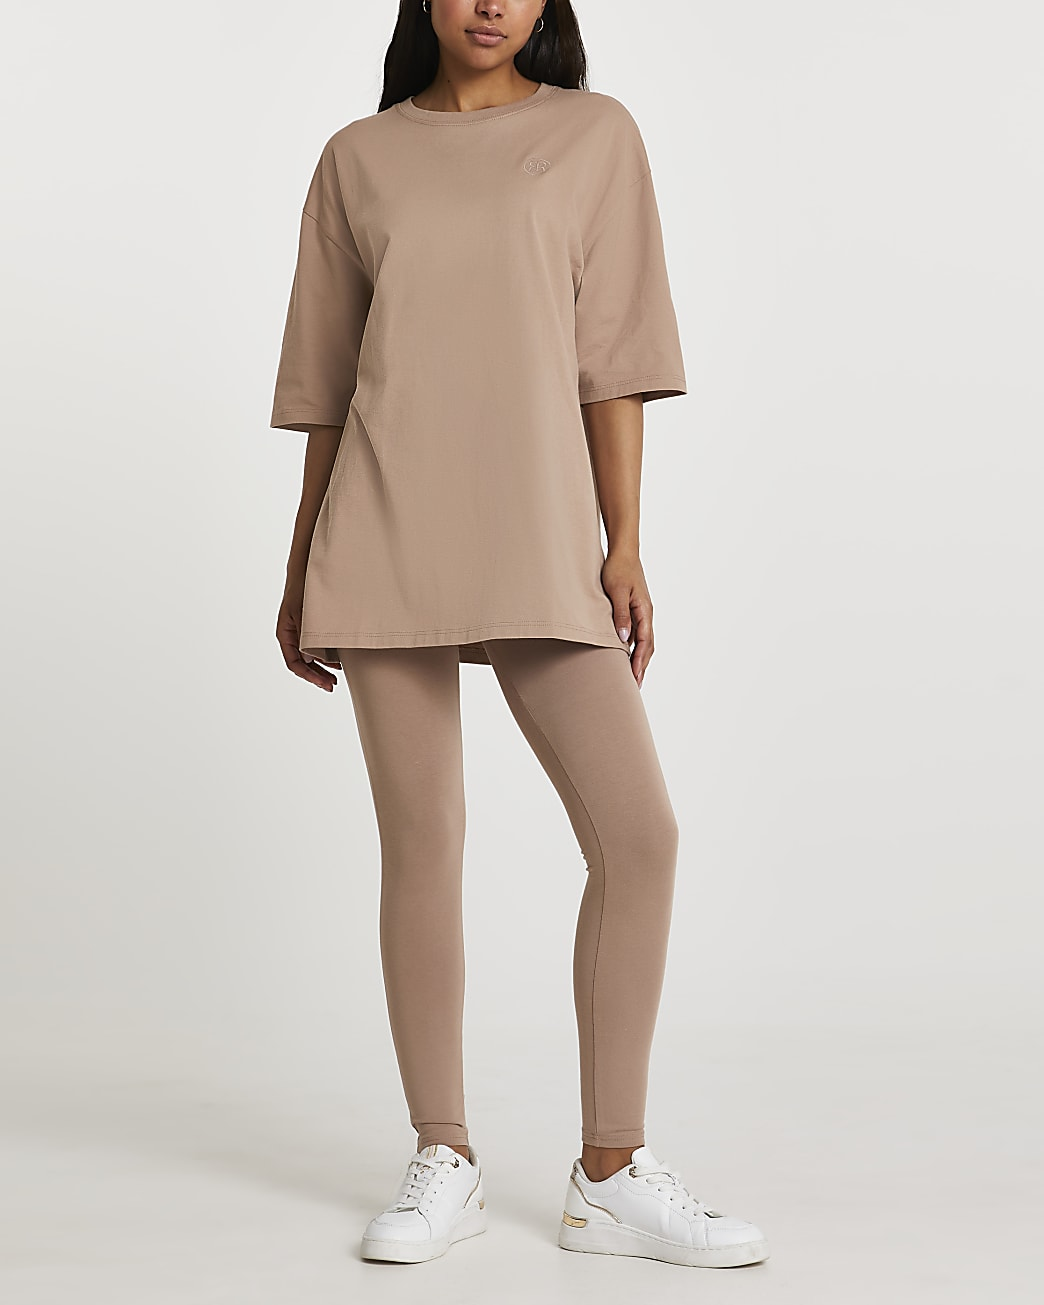 Beige oversized short sleeve t-shirt